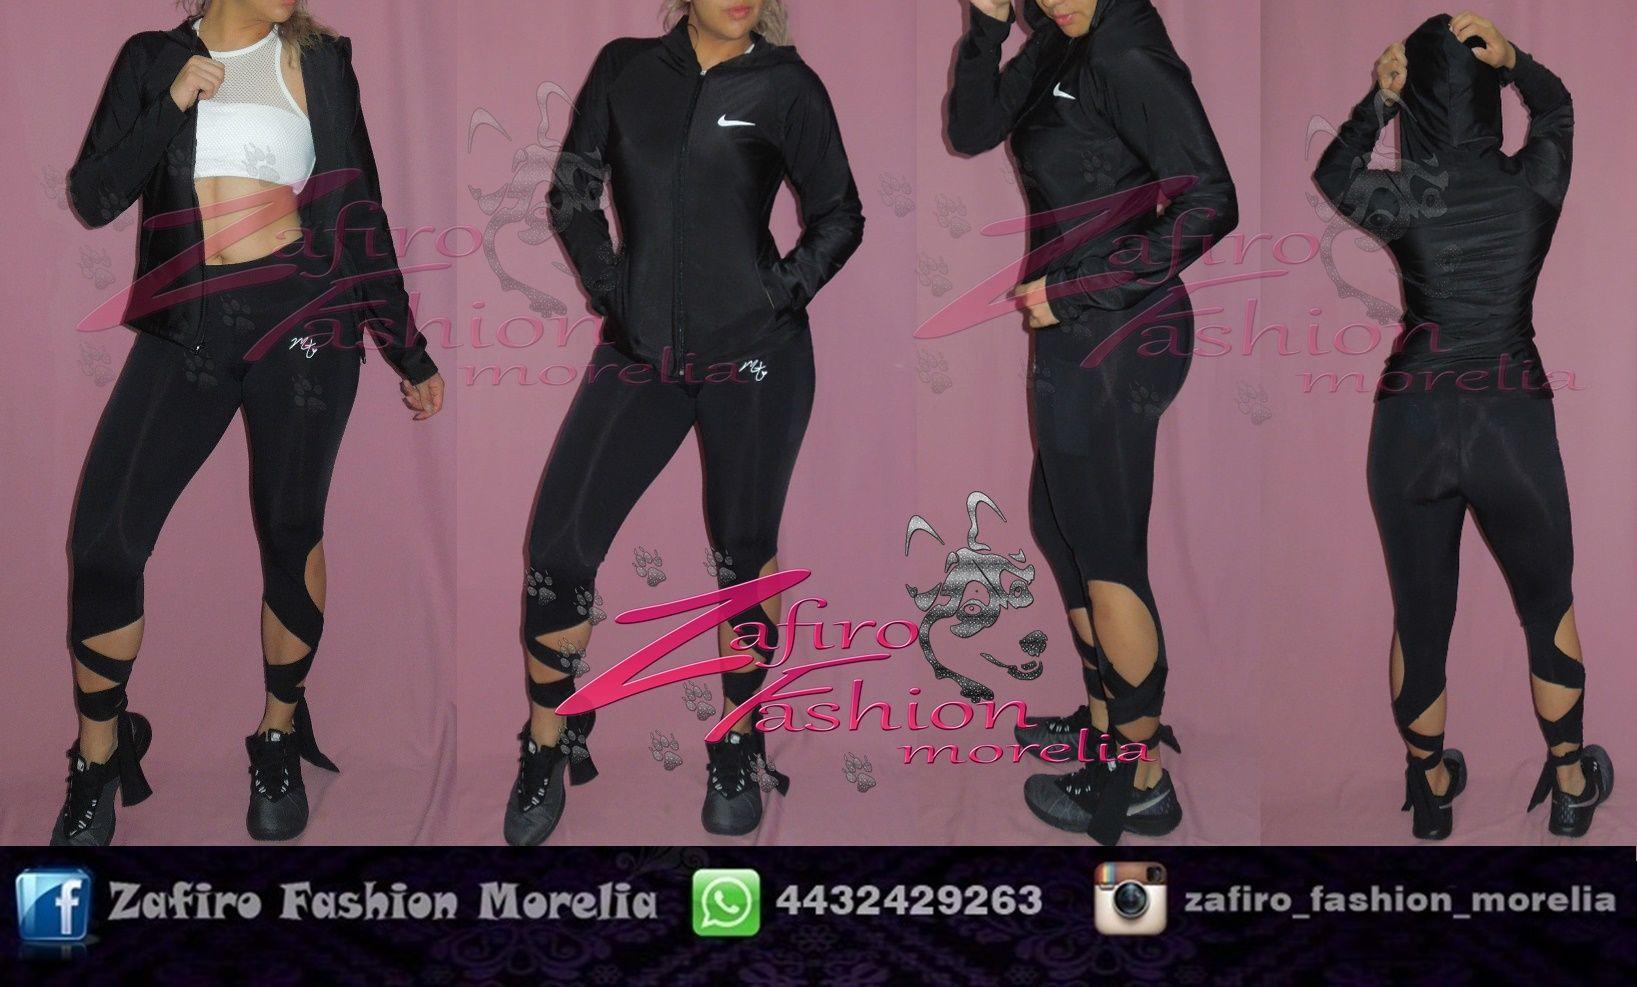 Conjunto Deportivo Nike Fashion. Negro y Blanco